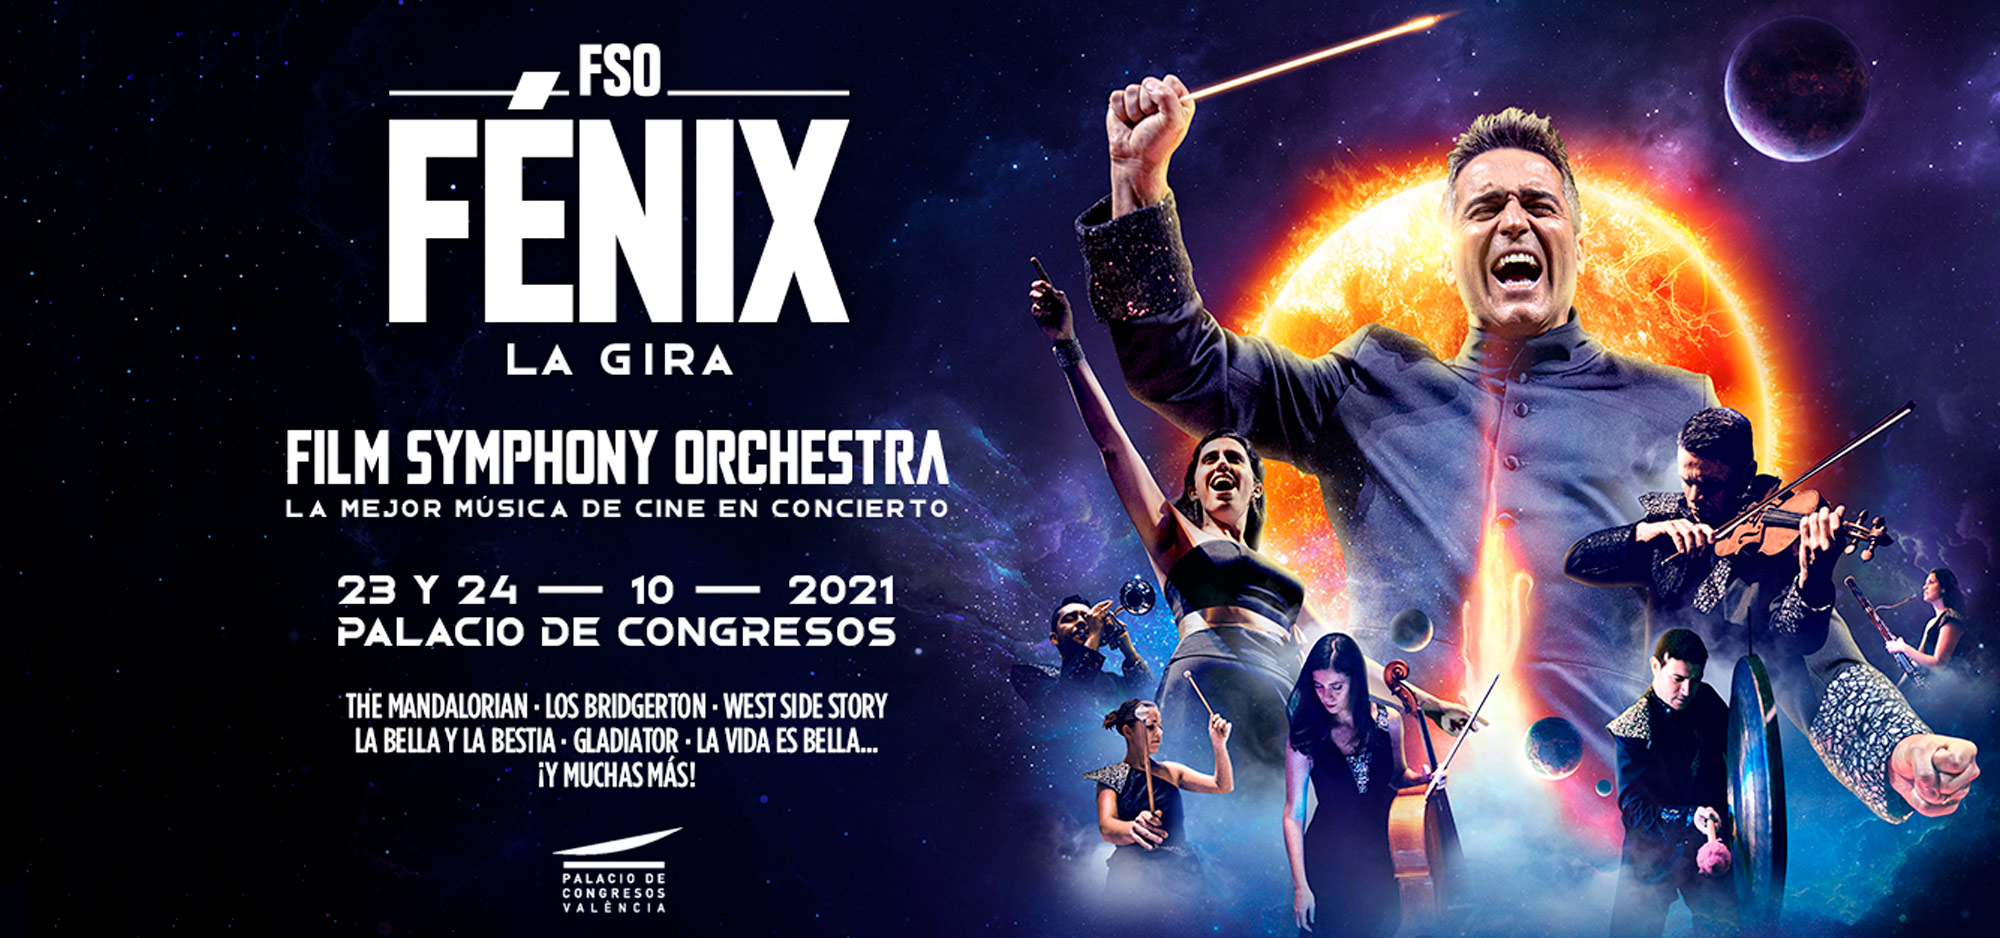 FSO Film Symphony Orchestra